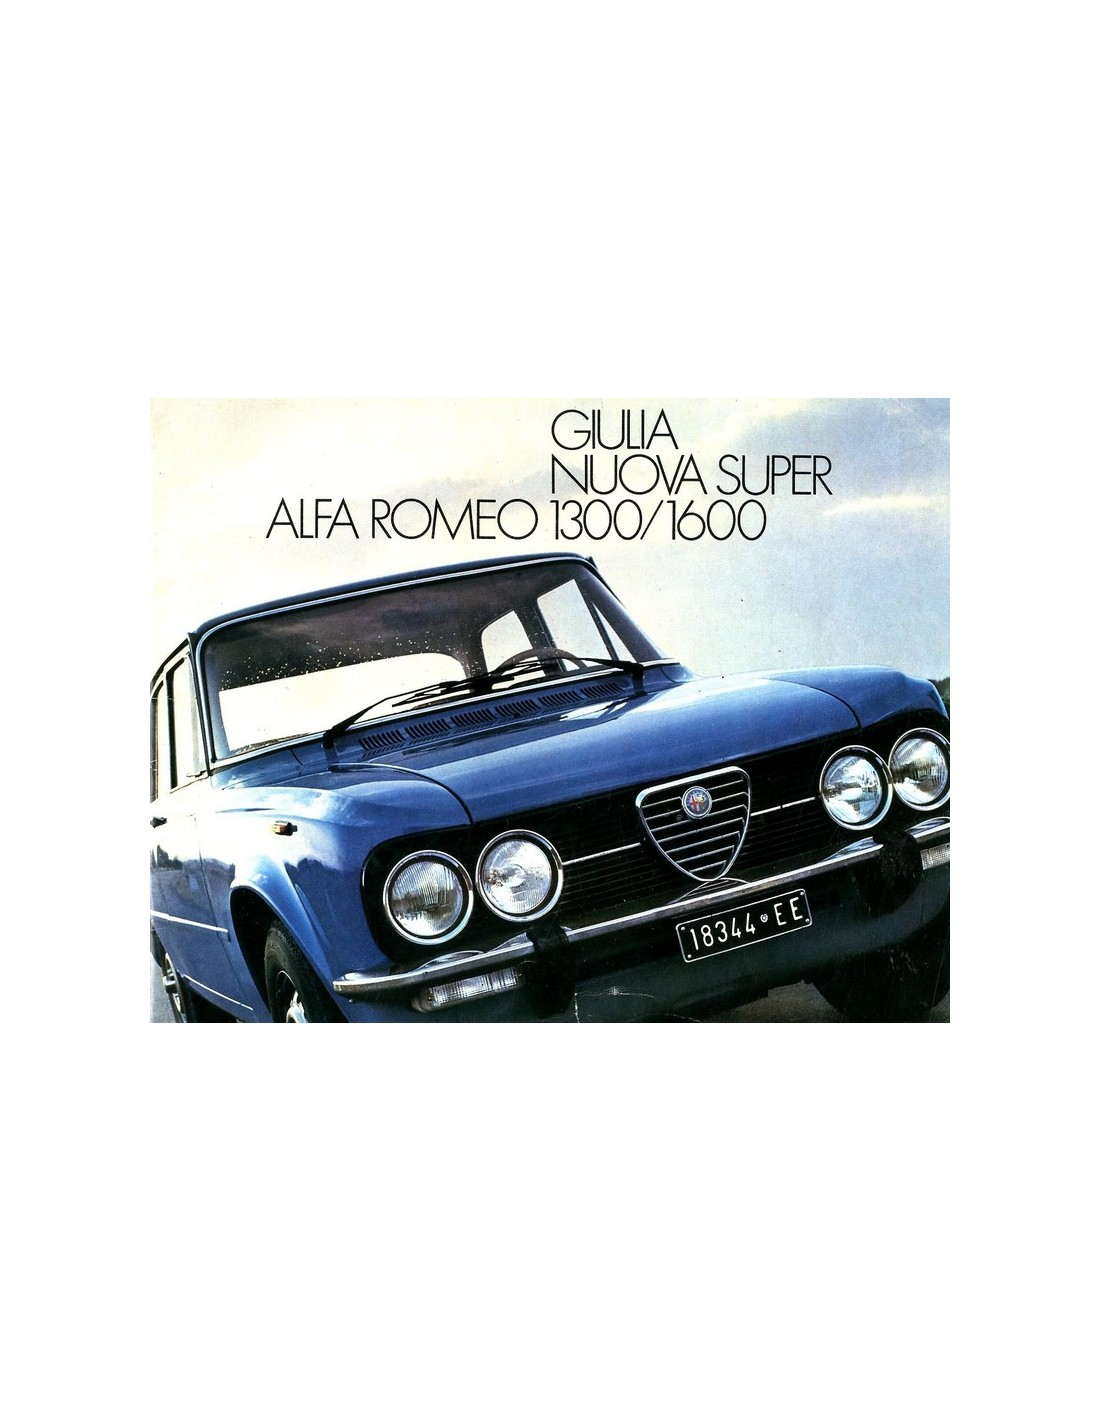 1975 ALFA ROMEO GIULIA NUOVA SUPER 1300 1600 BROCHURE DUTCH